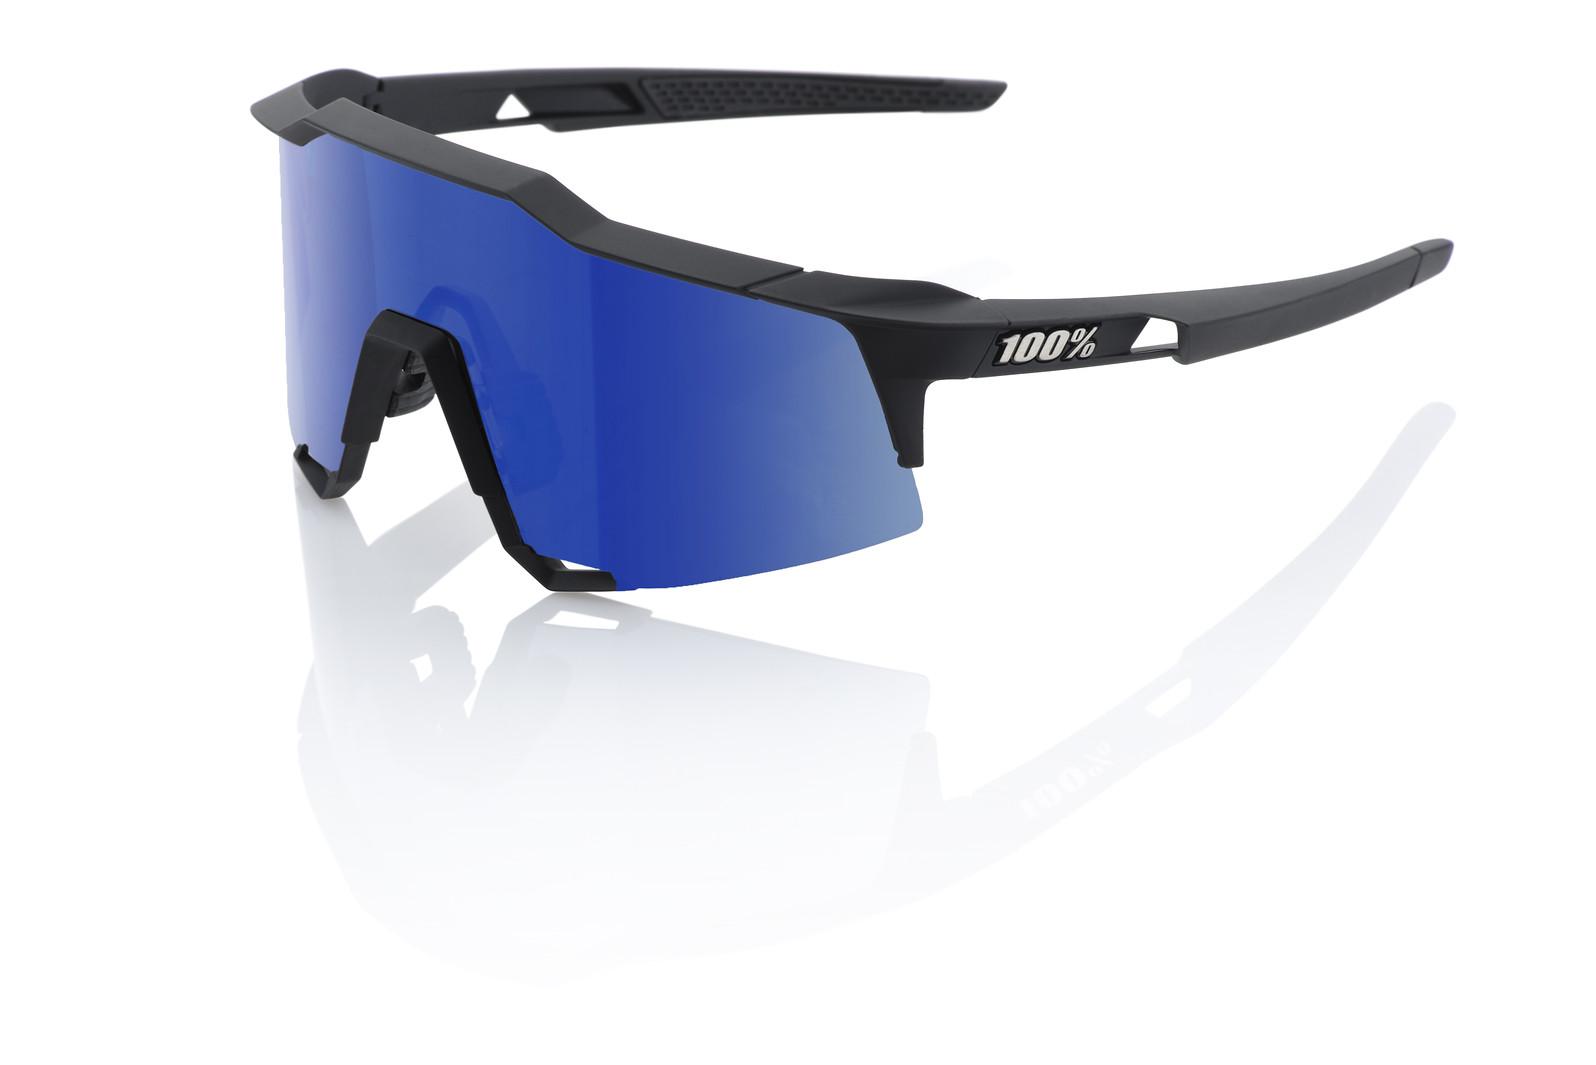 4c89a7fb0db18 100% Speedcraft LL Glasses - Reviews